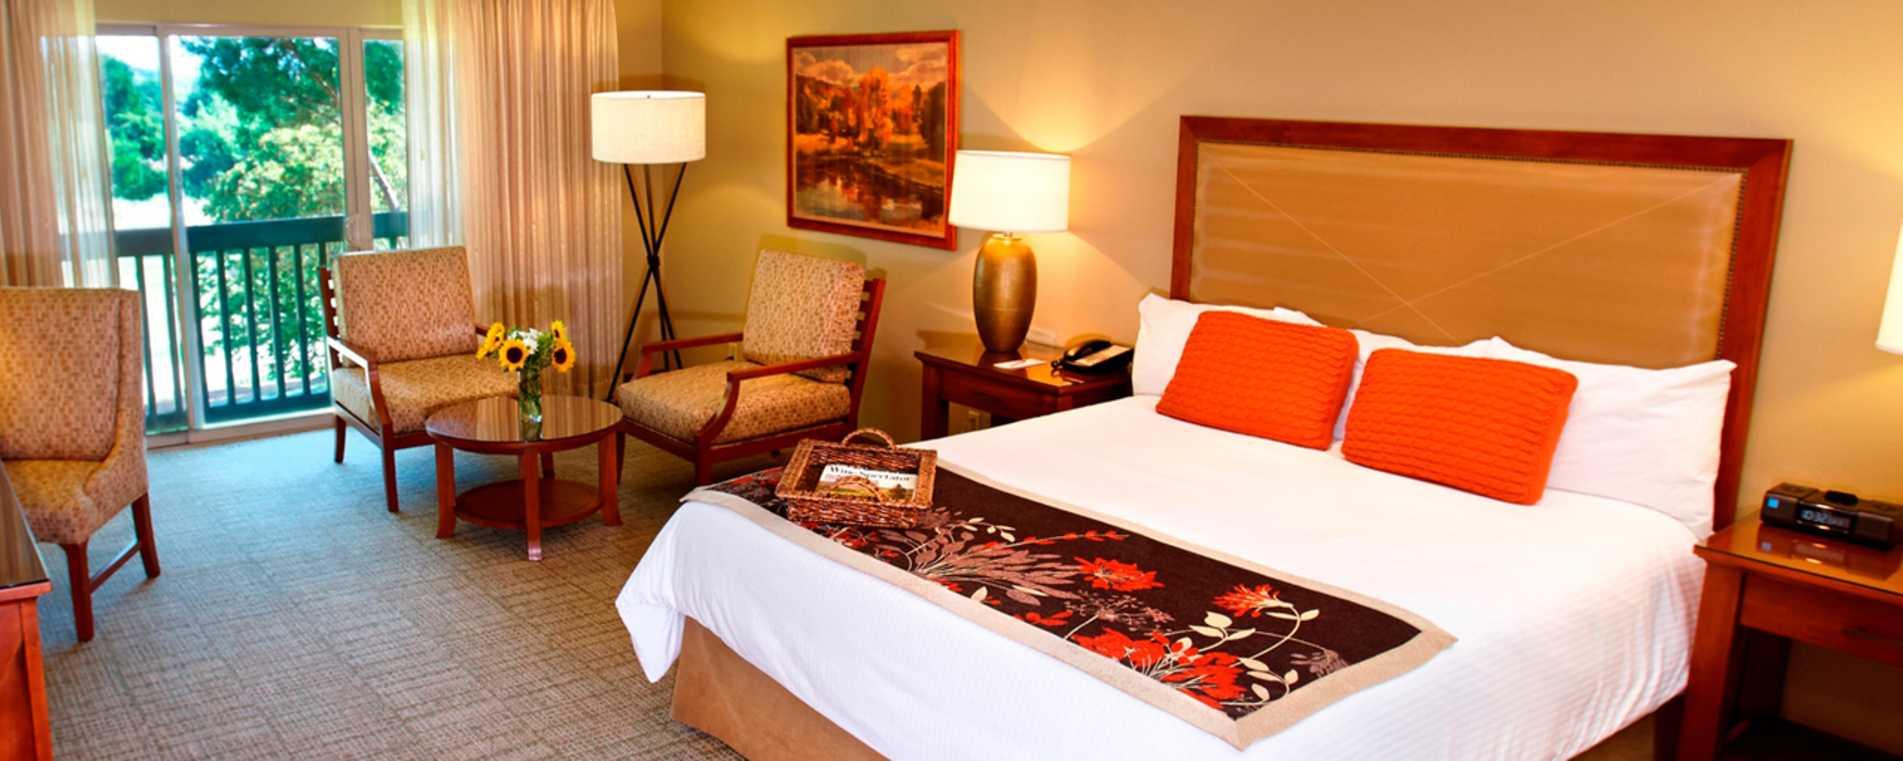 Guest Room - Temecula Creek Inn